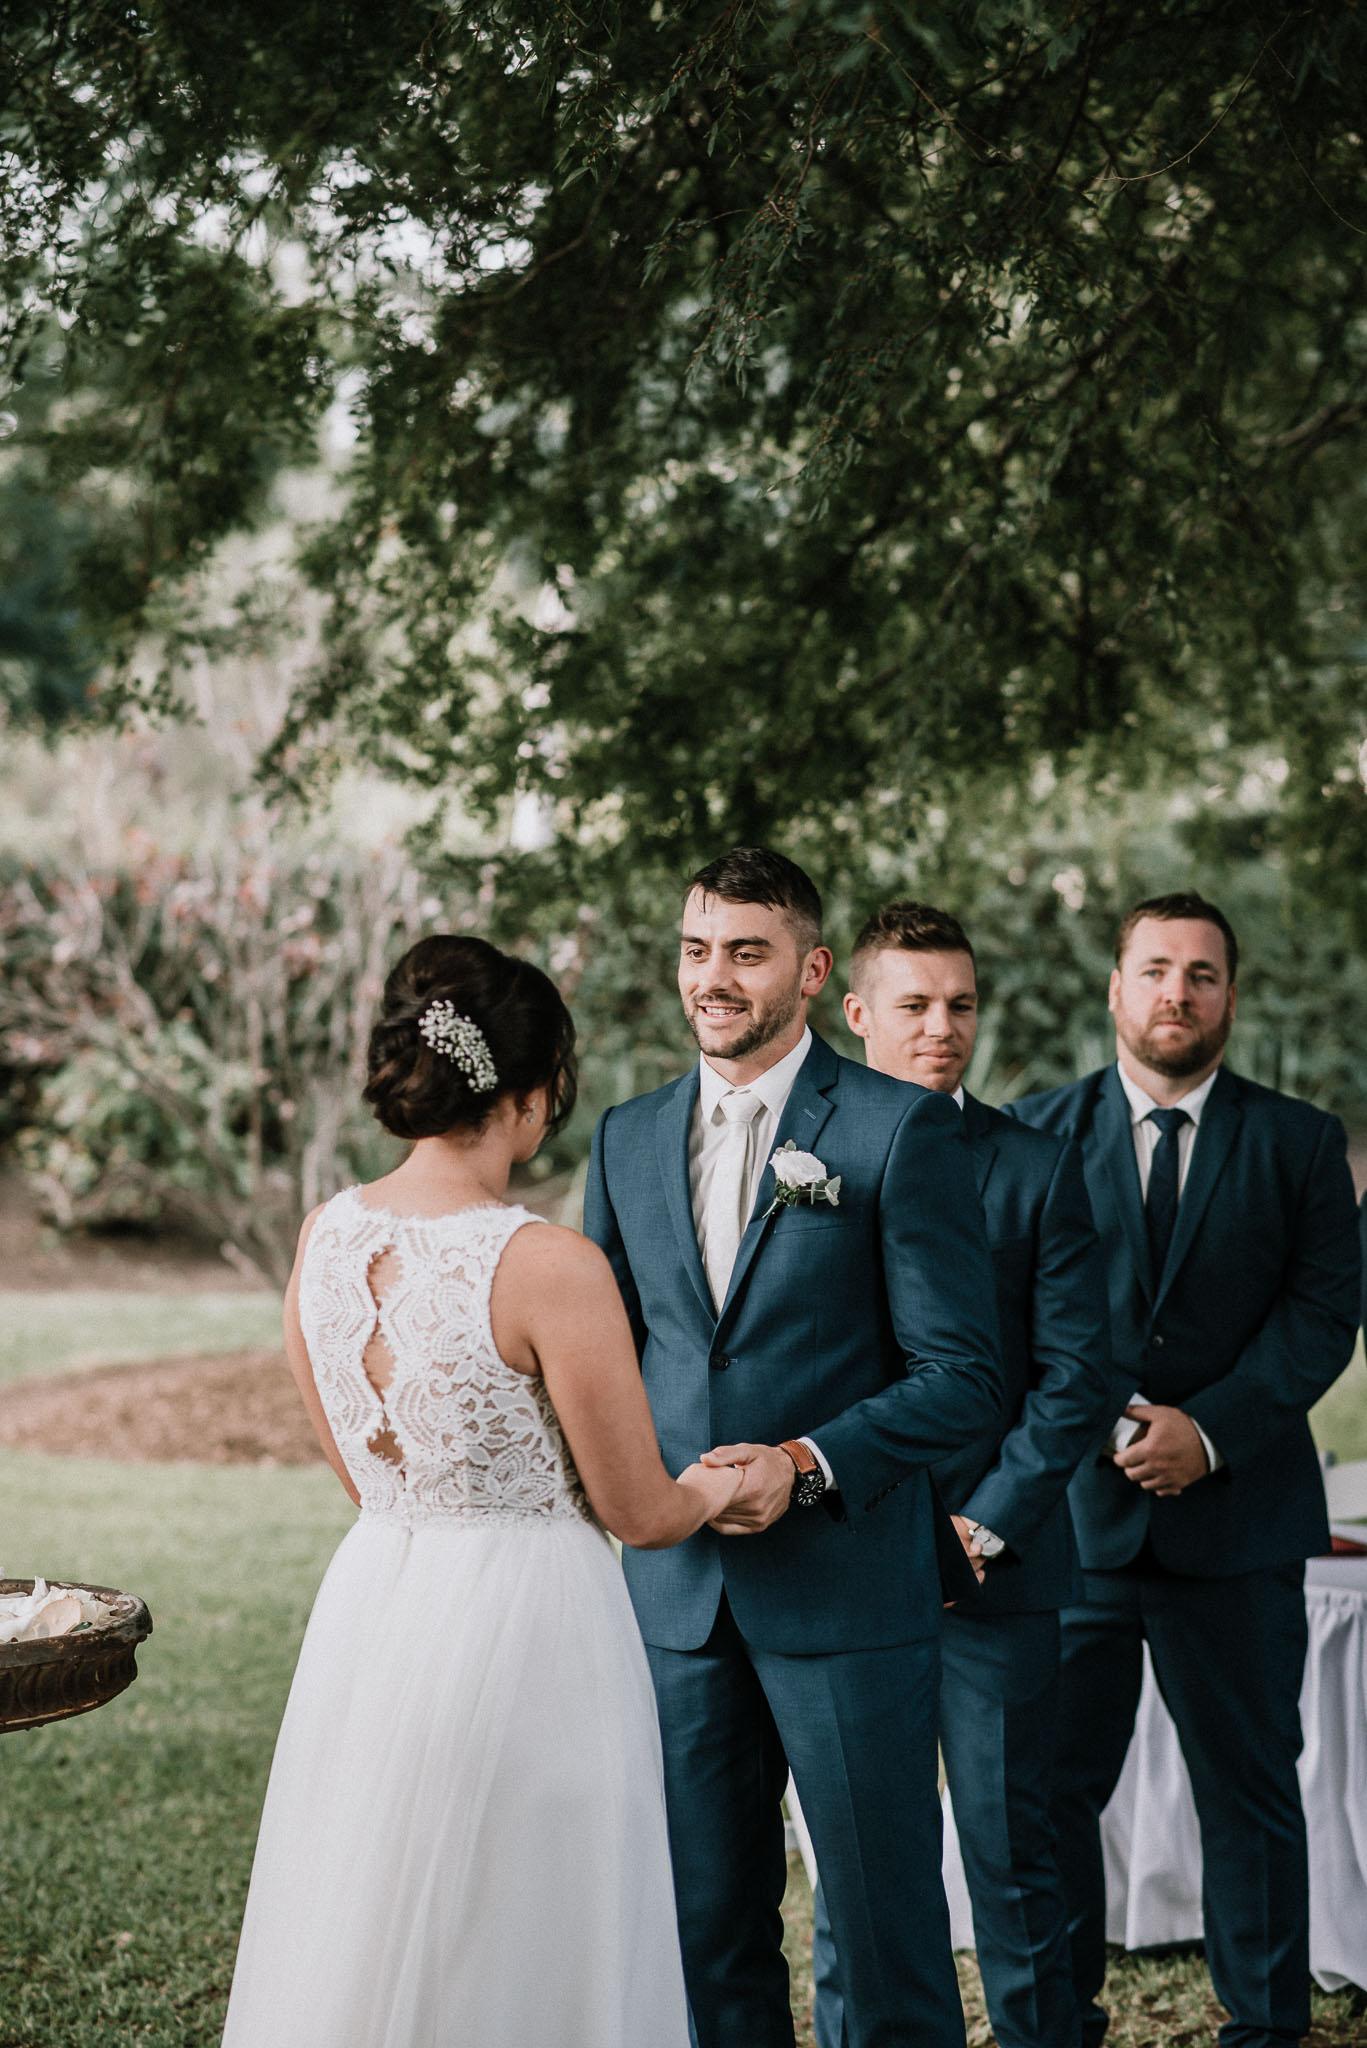 MECURE-RESORT-WEDDING-KING-WEB-45.jpg